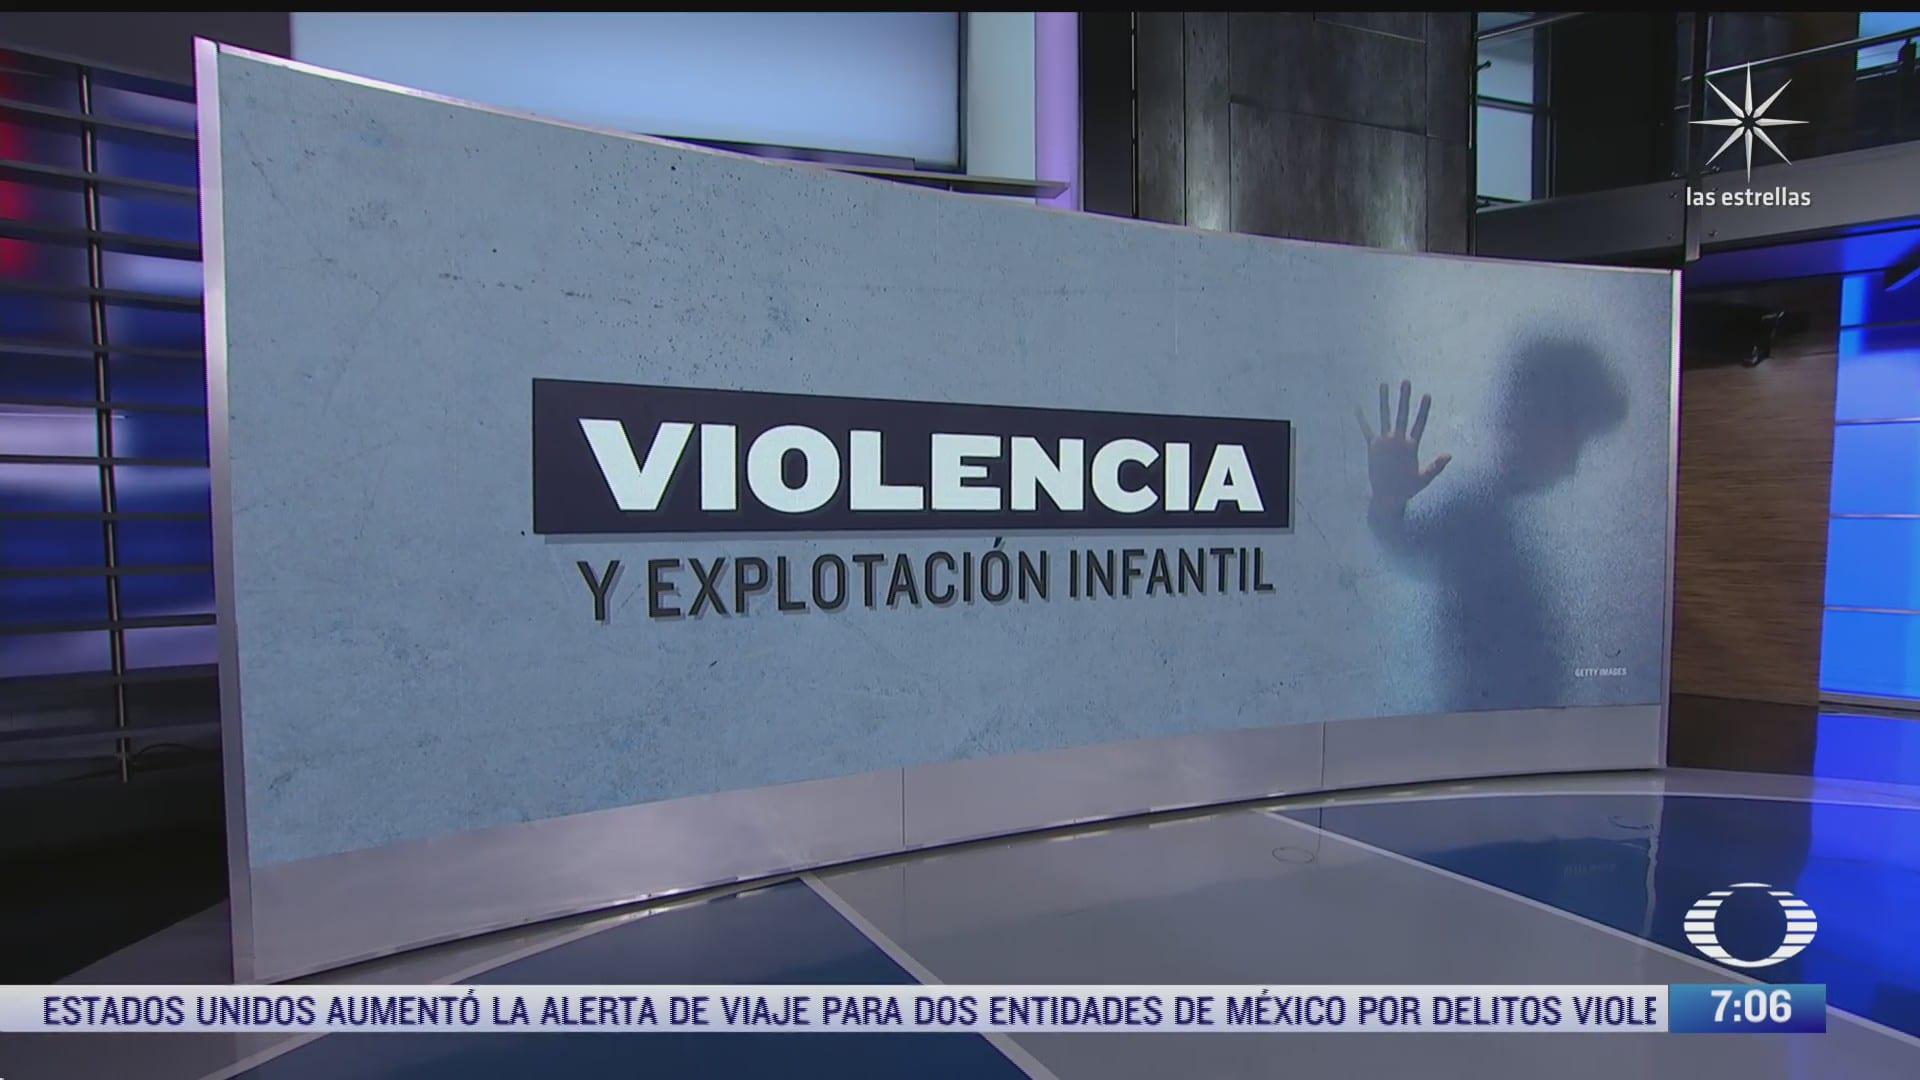 mexico primer lugar en consumo de pornografia infantil